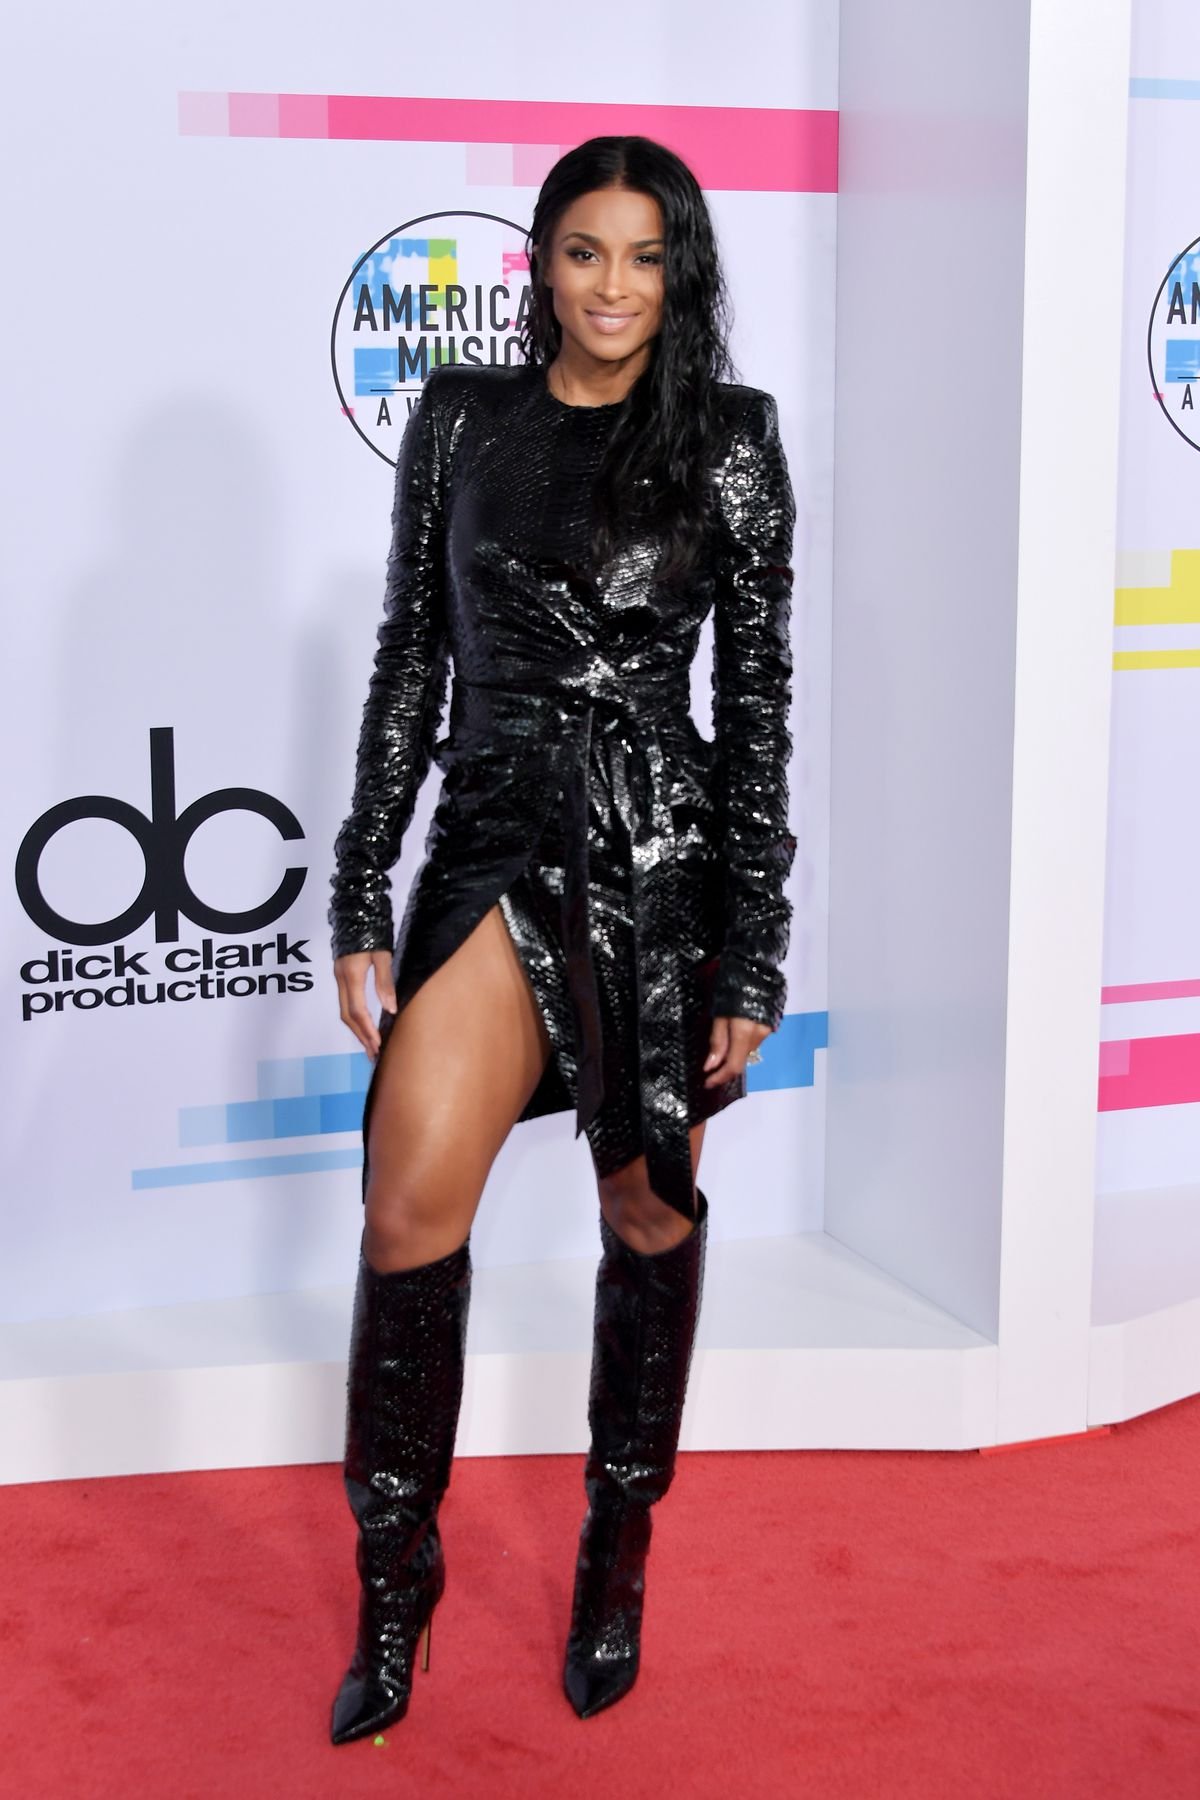 LOS ANGELES, CA - NOVEMBER 19:  Ciara attends the 2017 American Music Awards at Microsoft Theater on November 19, 2017 in Los Angeles, California.